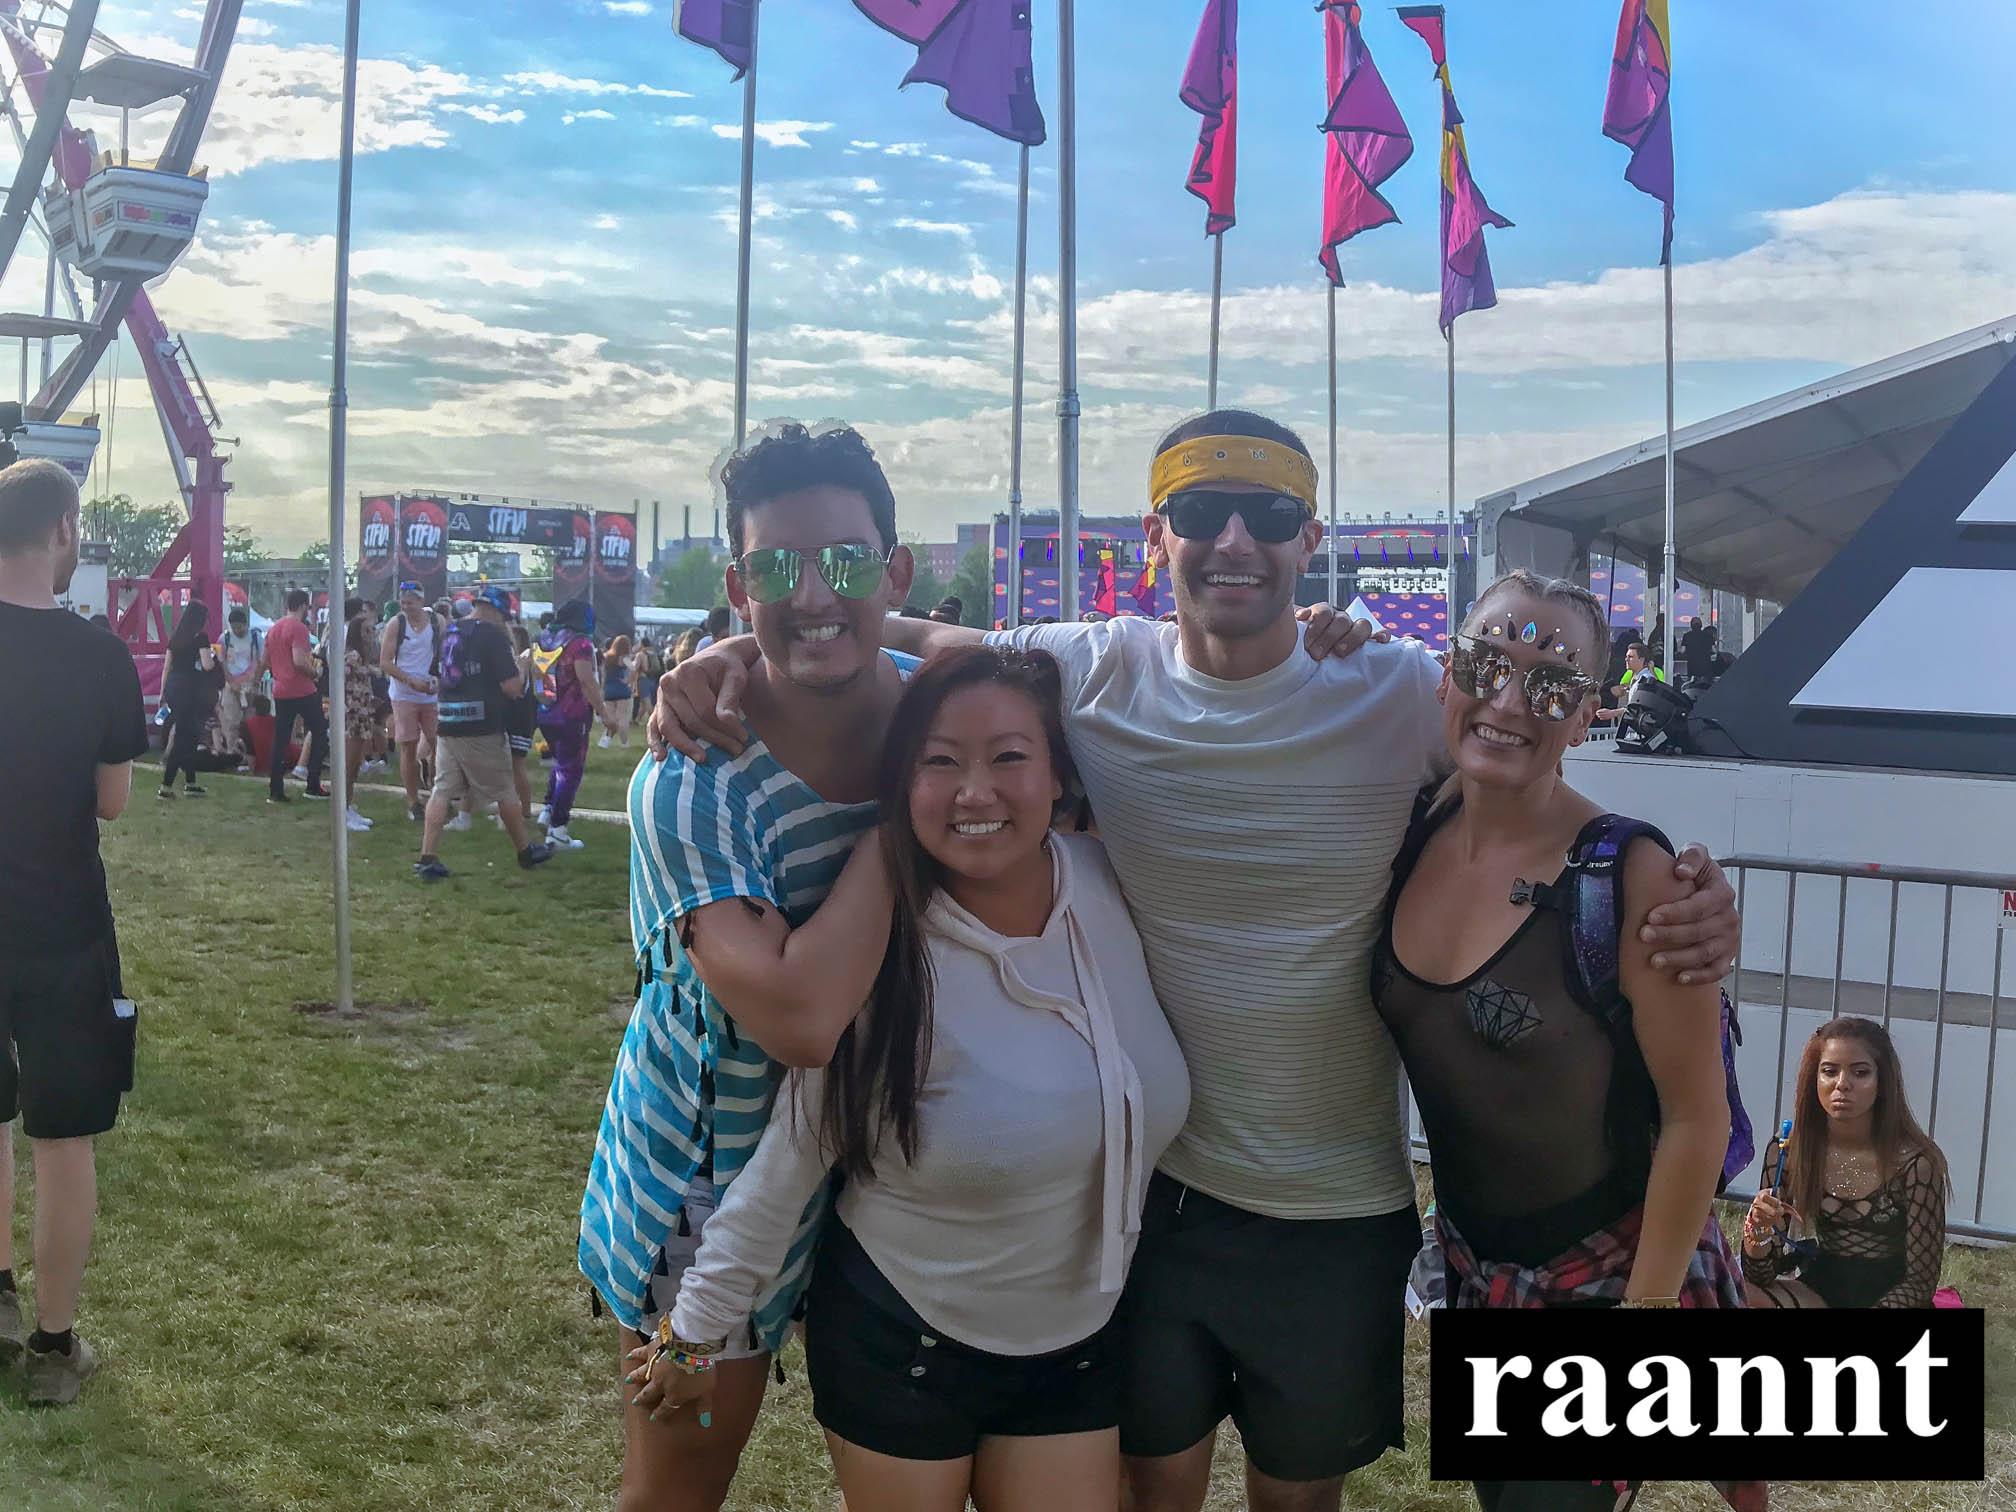 Alex Paredes, Zac Lehman, Paulina Kim, Lindsay Perrazon from Indianapolis